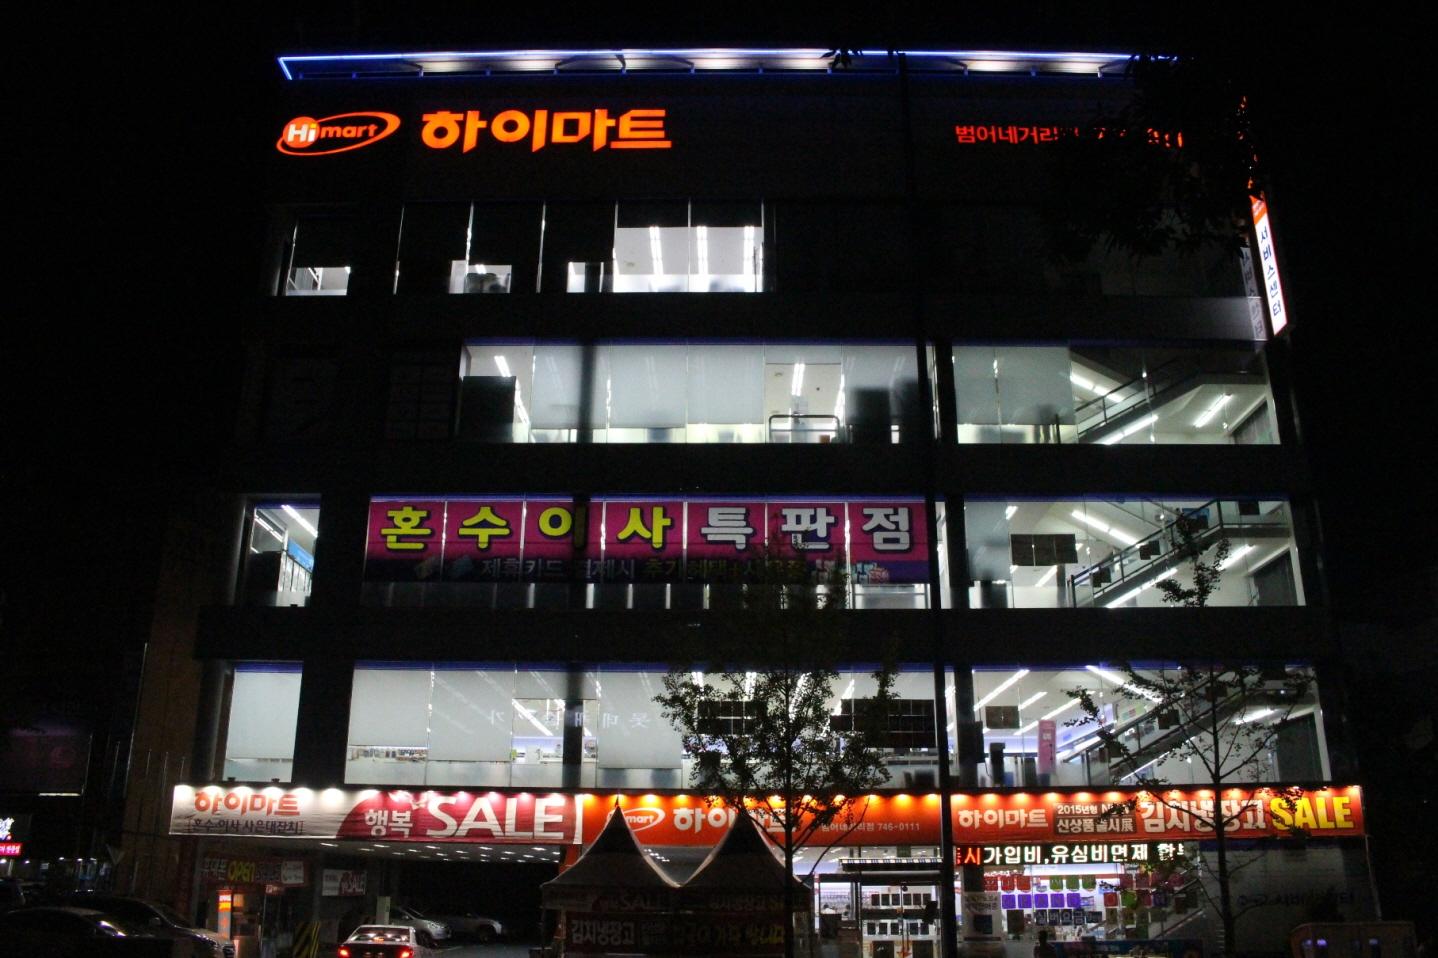 Lotte himart泛鱼十字路口店(롯데 하이마트 범어네거리점)